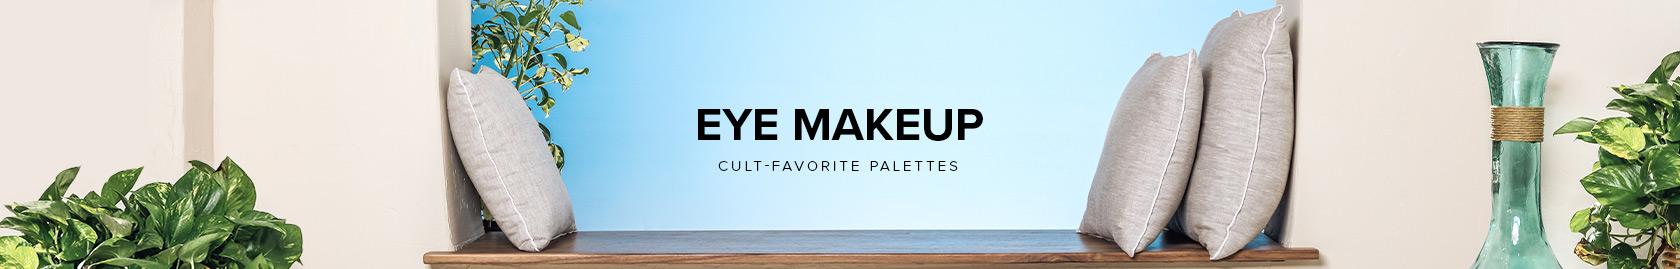 Eye Makeup - Cult Favorite Palettes